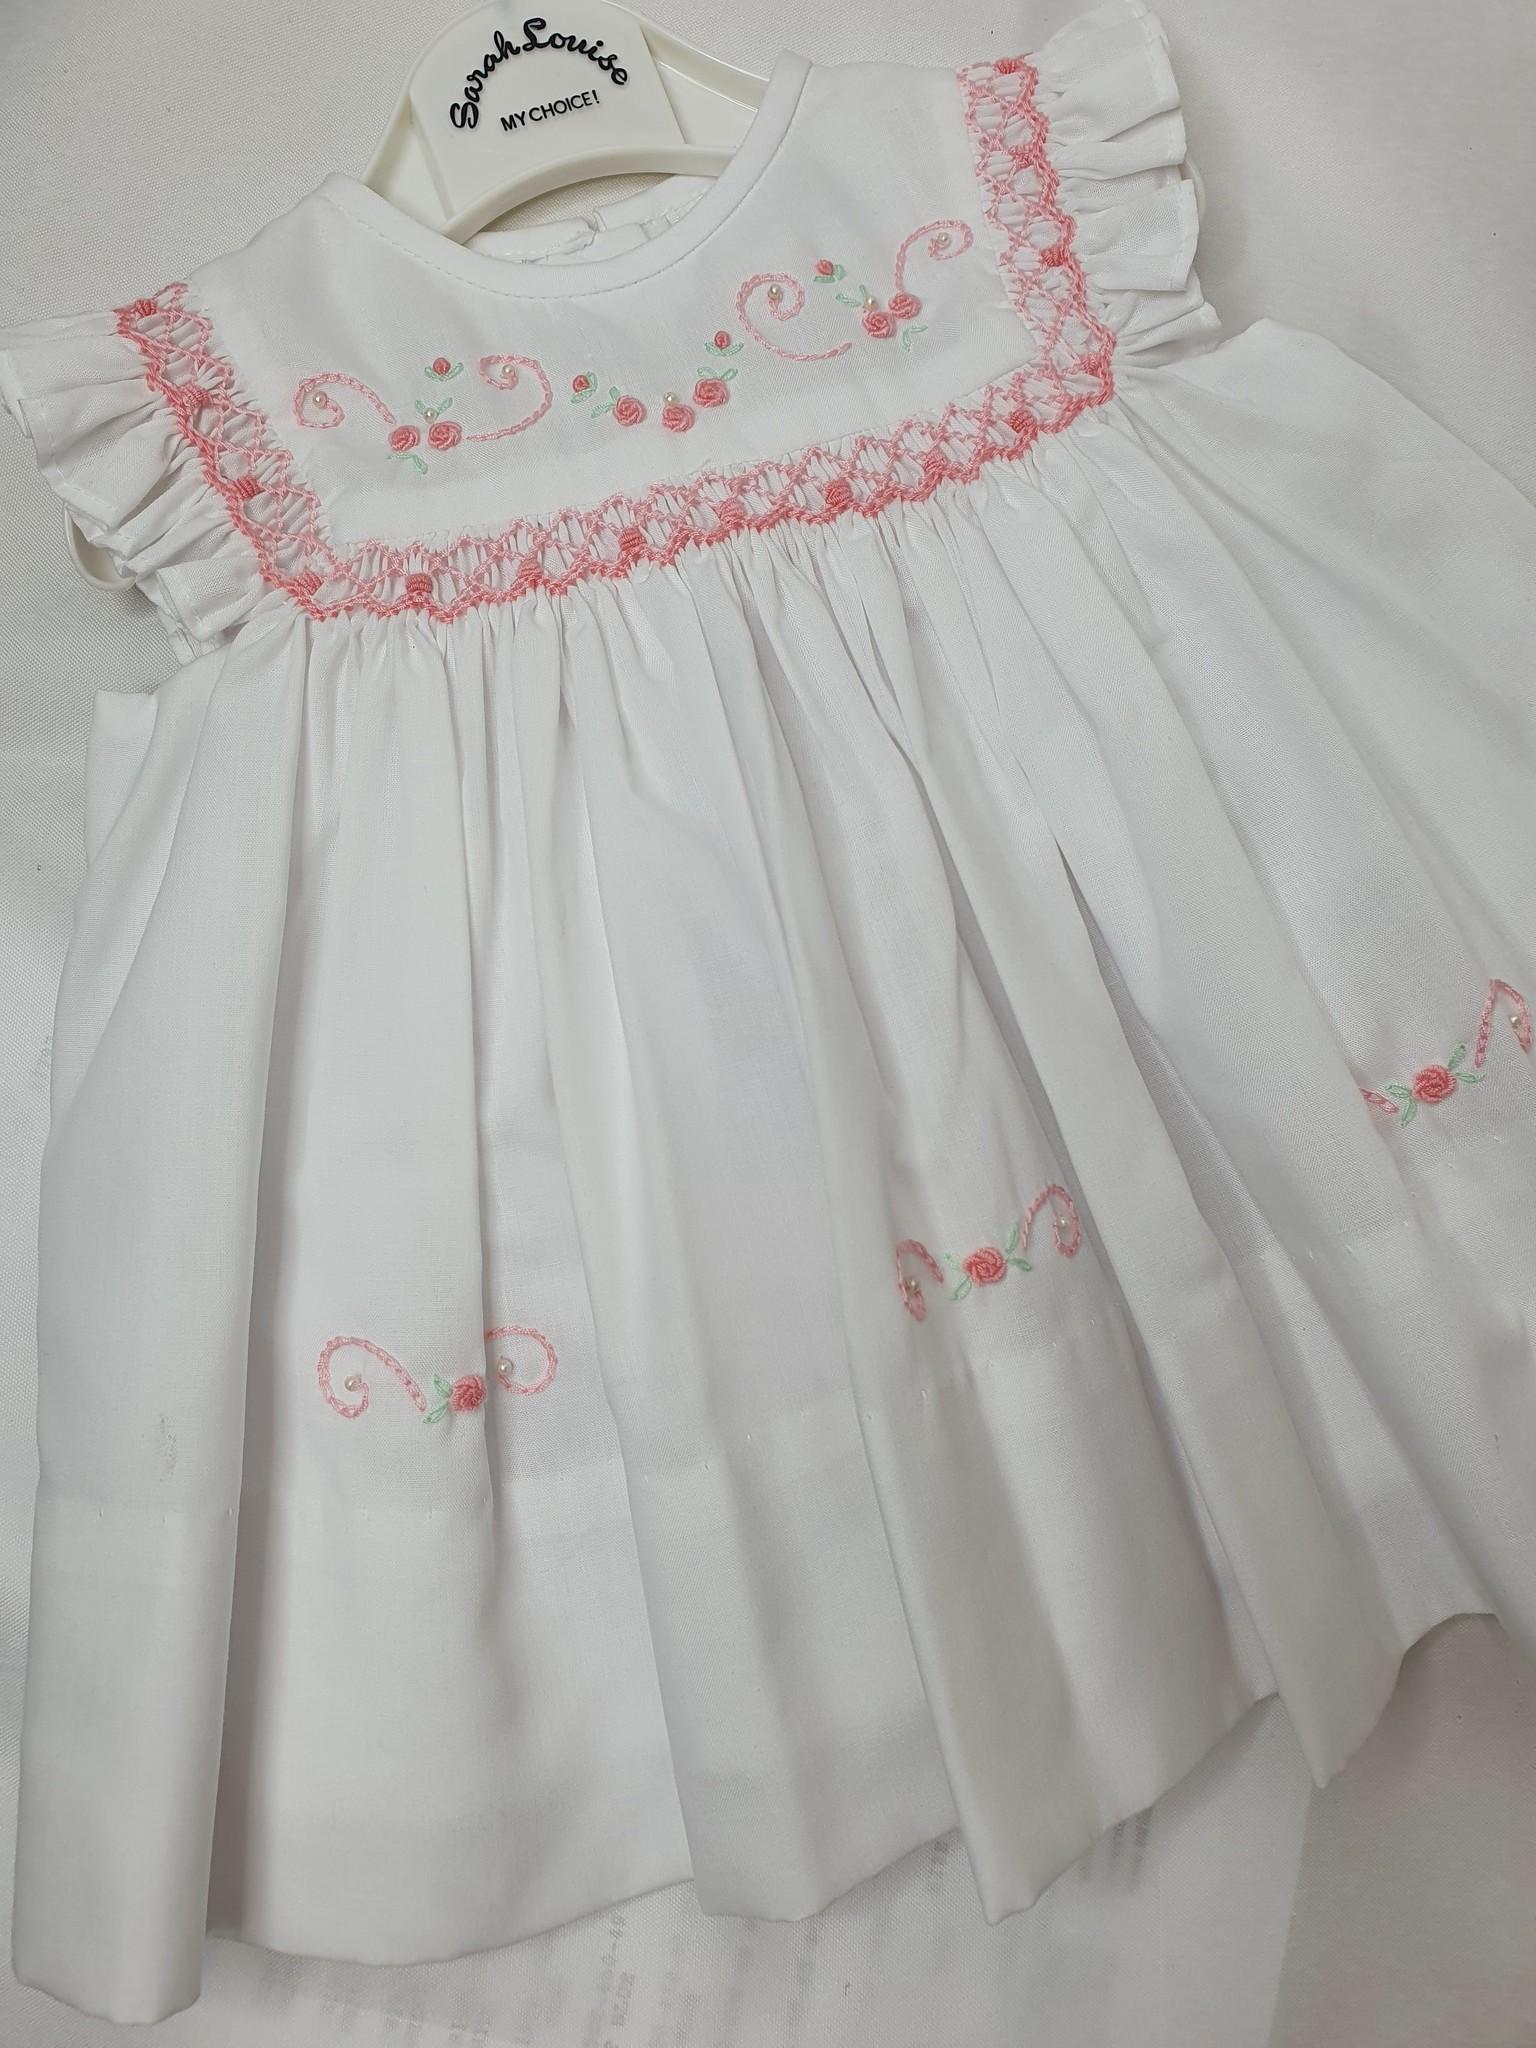 Sarah Louise Sarah Louise White Frill Dress